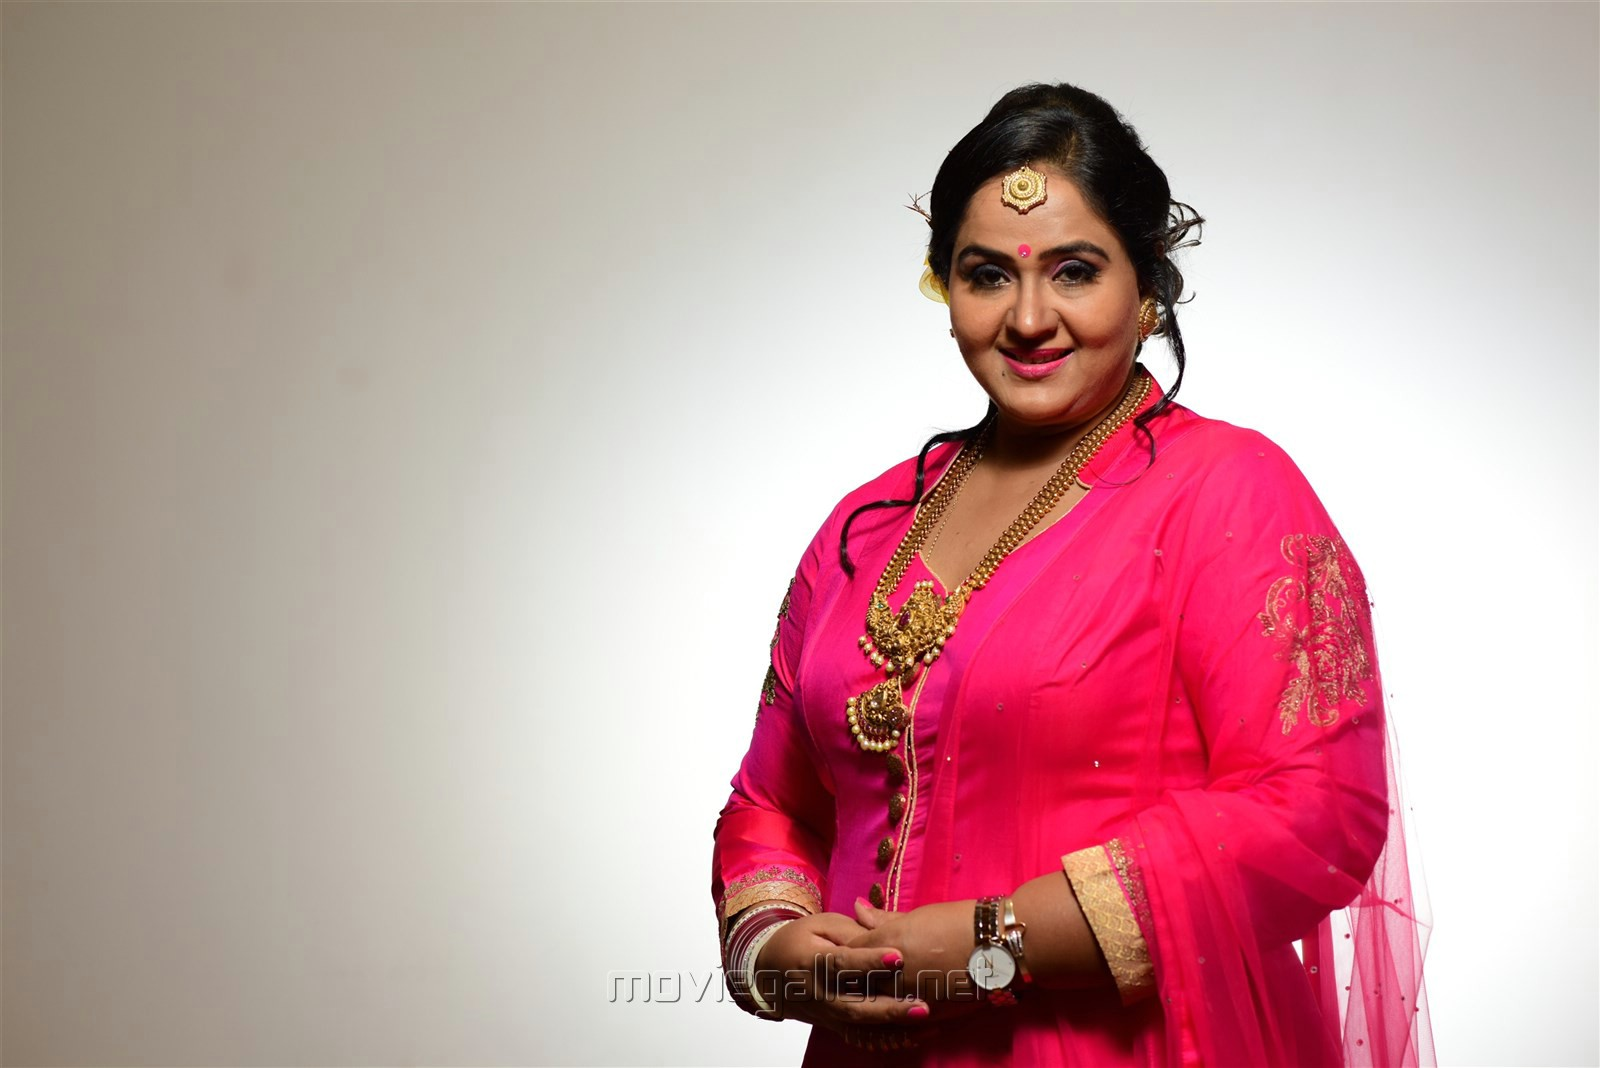 Priyanka Chopra Indian Actress - Who's Dated Who? Actress radha husband photos